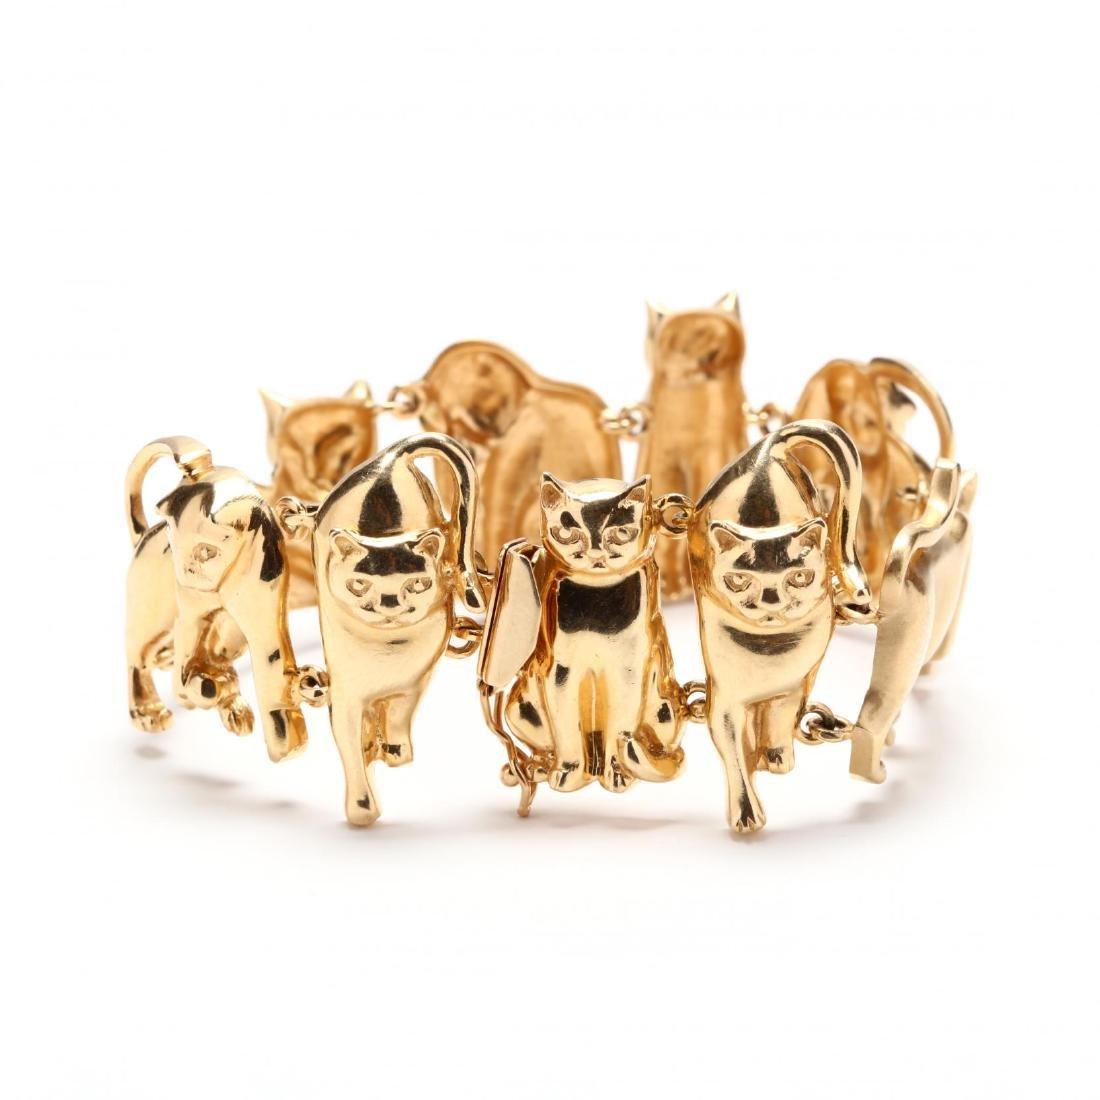 14KT Gold Feline Motif Bracelet, Ardian - 3